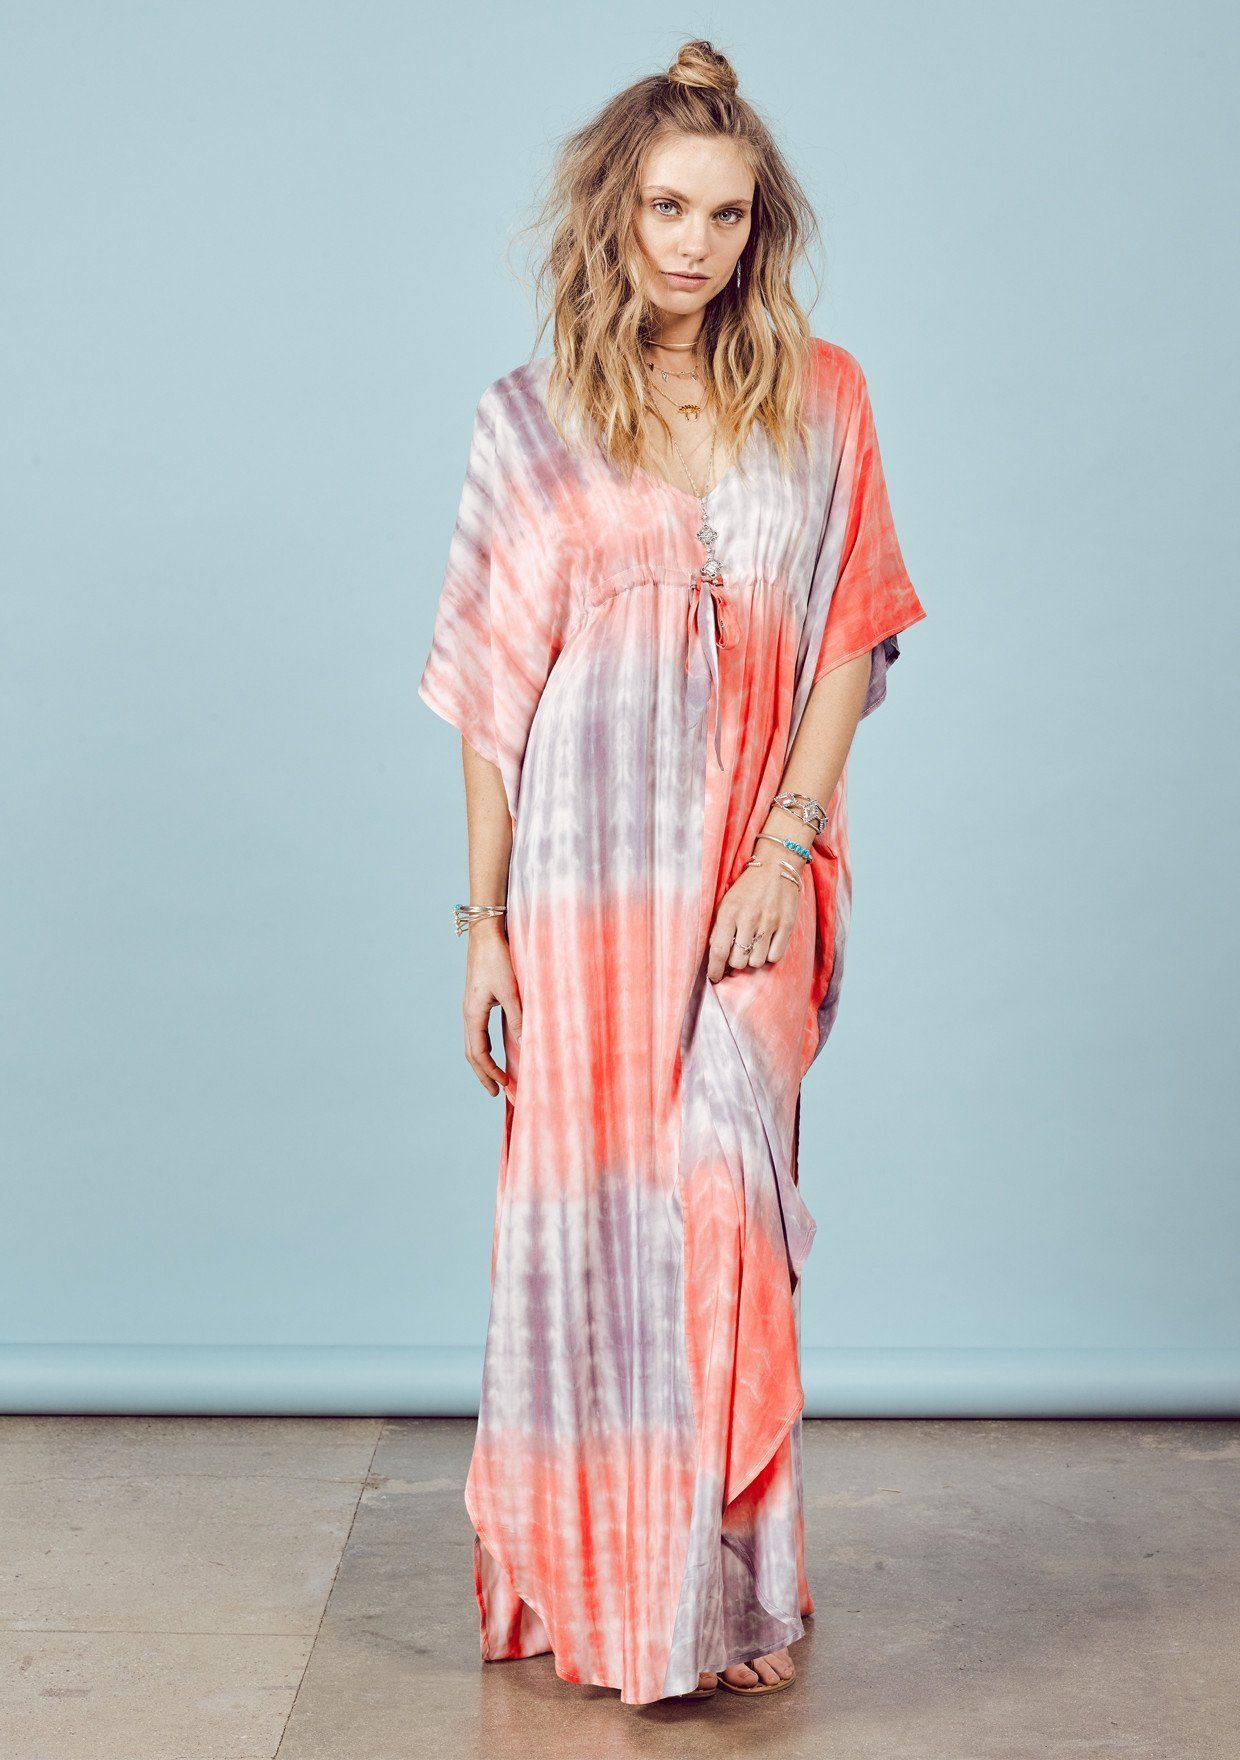 aa793f7b29 The Raya Coral Boho Caftan Dress